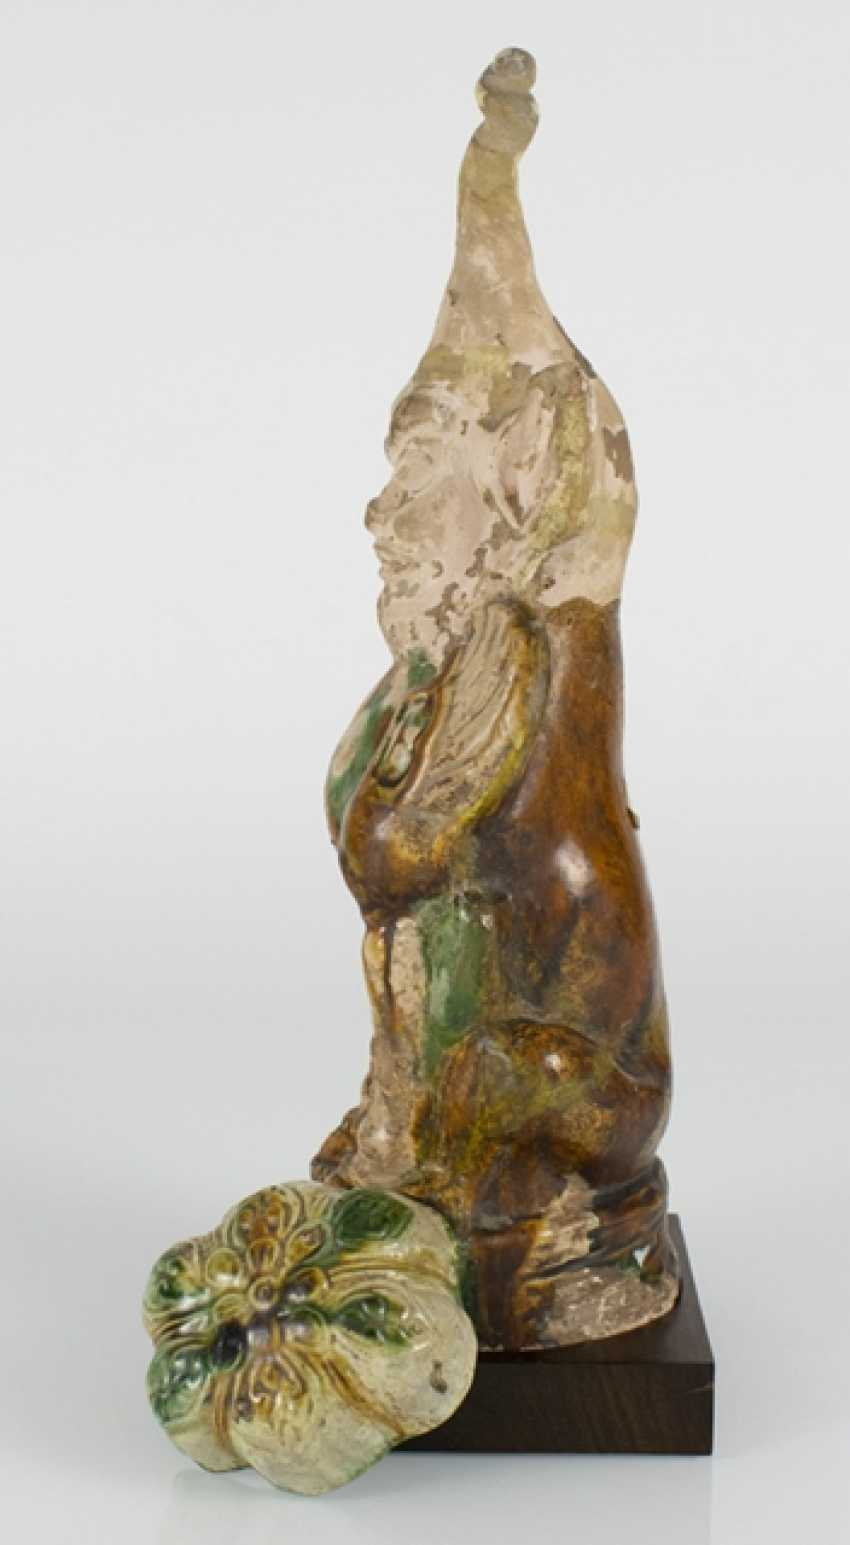 Guardian figure and the flower-shaped bowl with Sancai glaze - photo 2